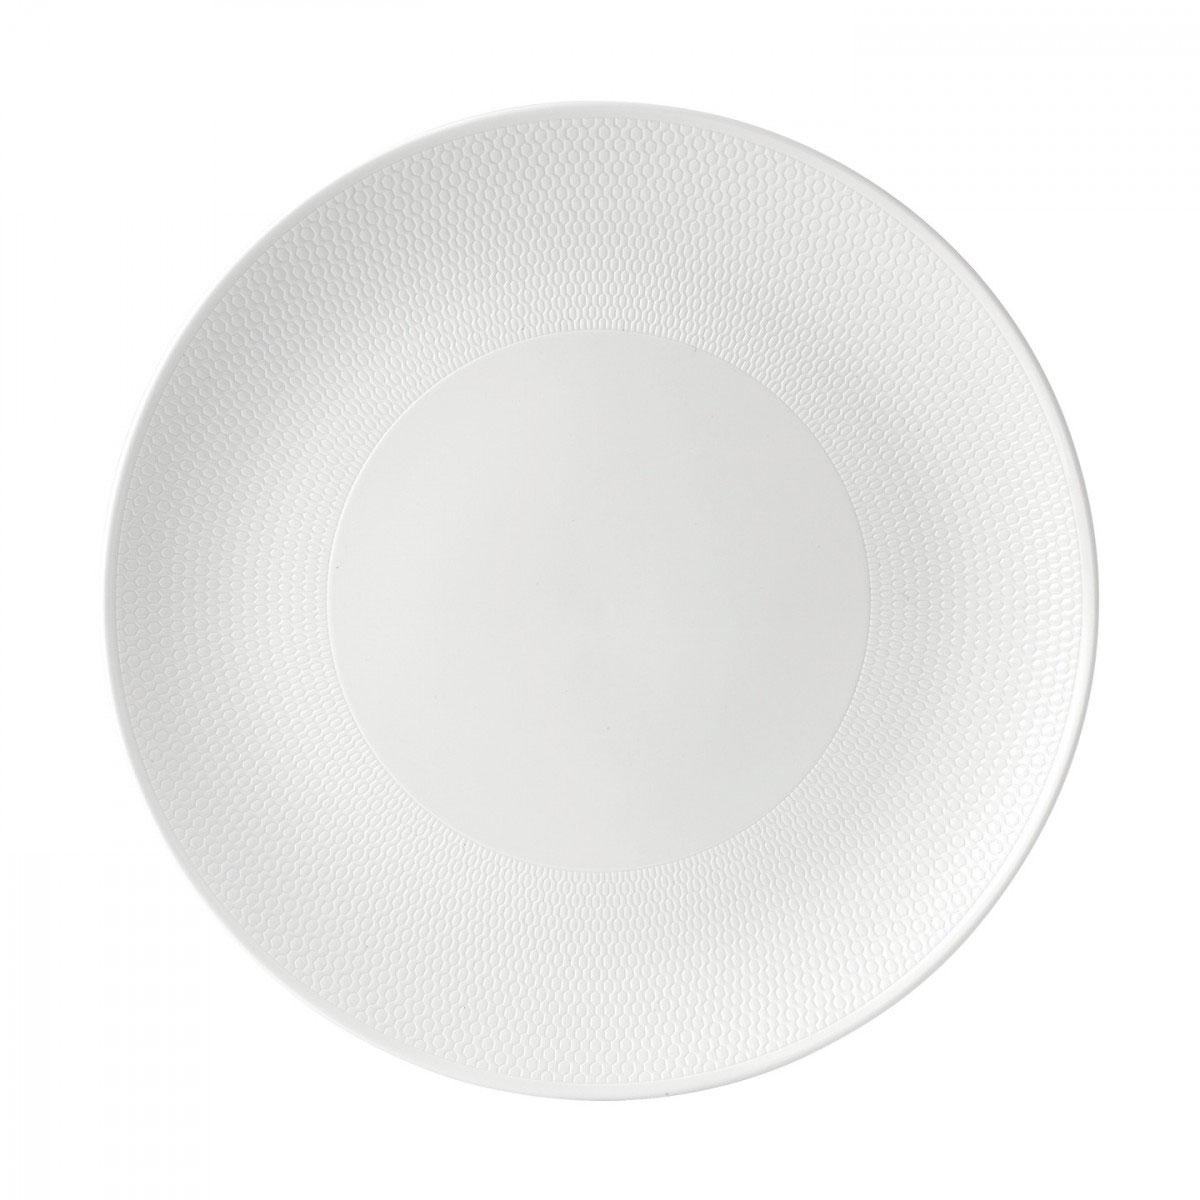 Wedgwood Gio Serving Platter